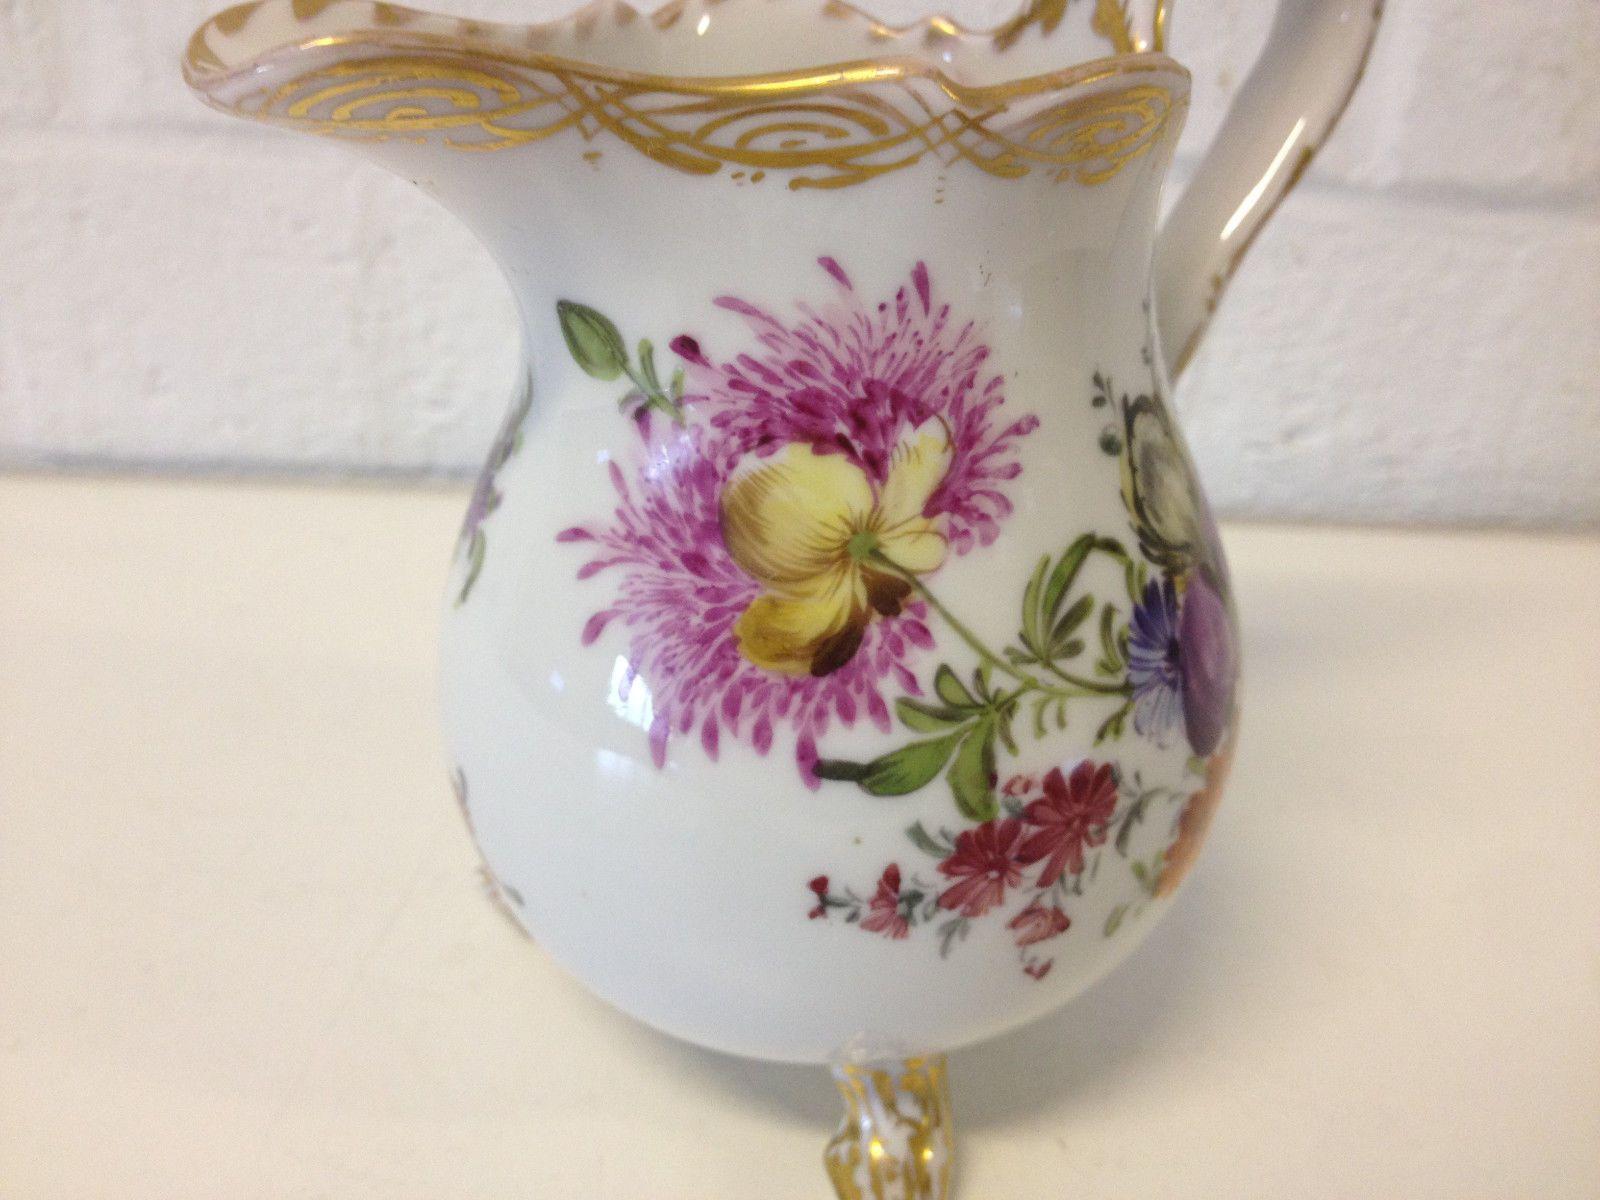 Vintage Antique German Meissen Porcelain Creamer w Hand Painted Floral Dec   eBay